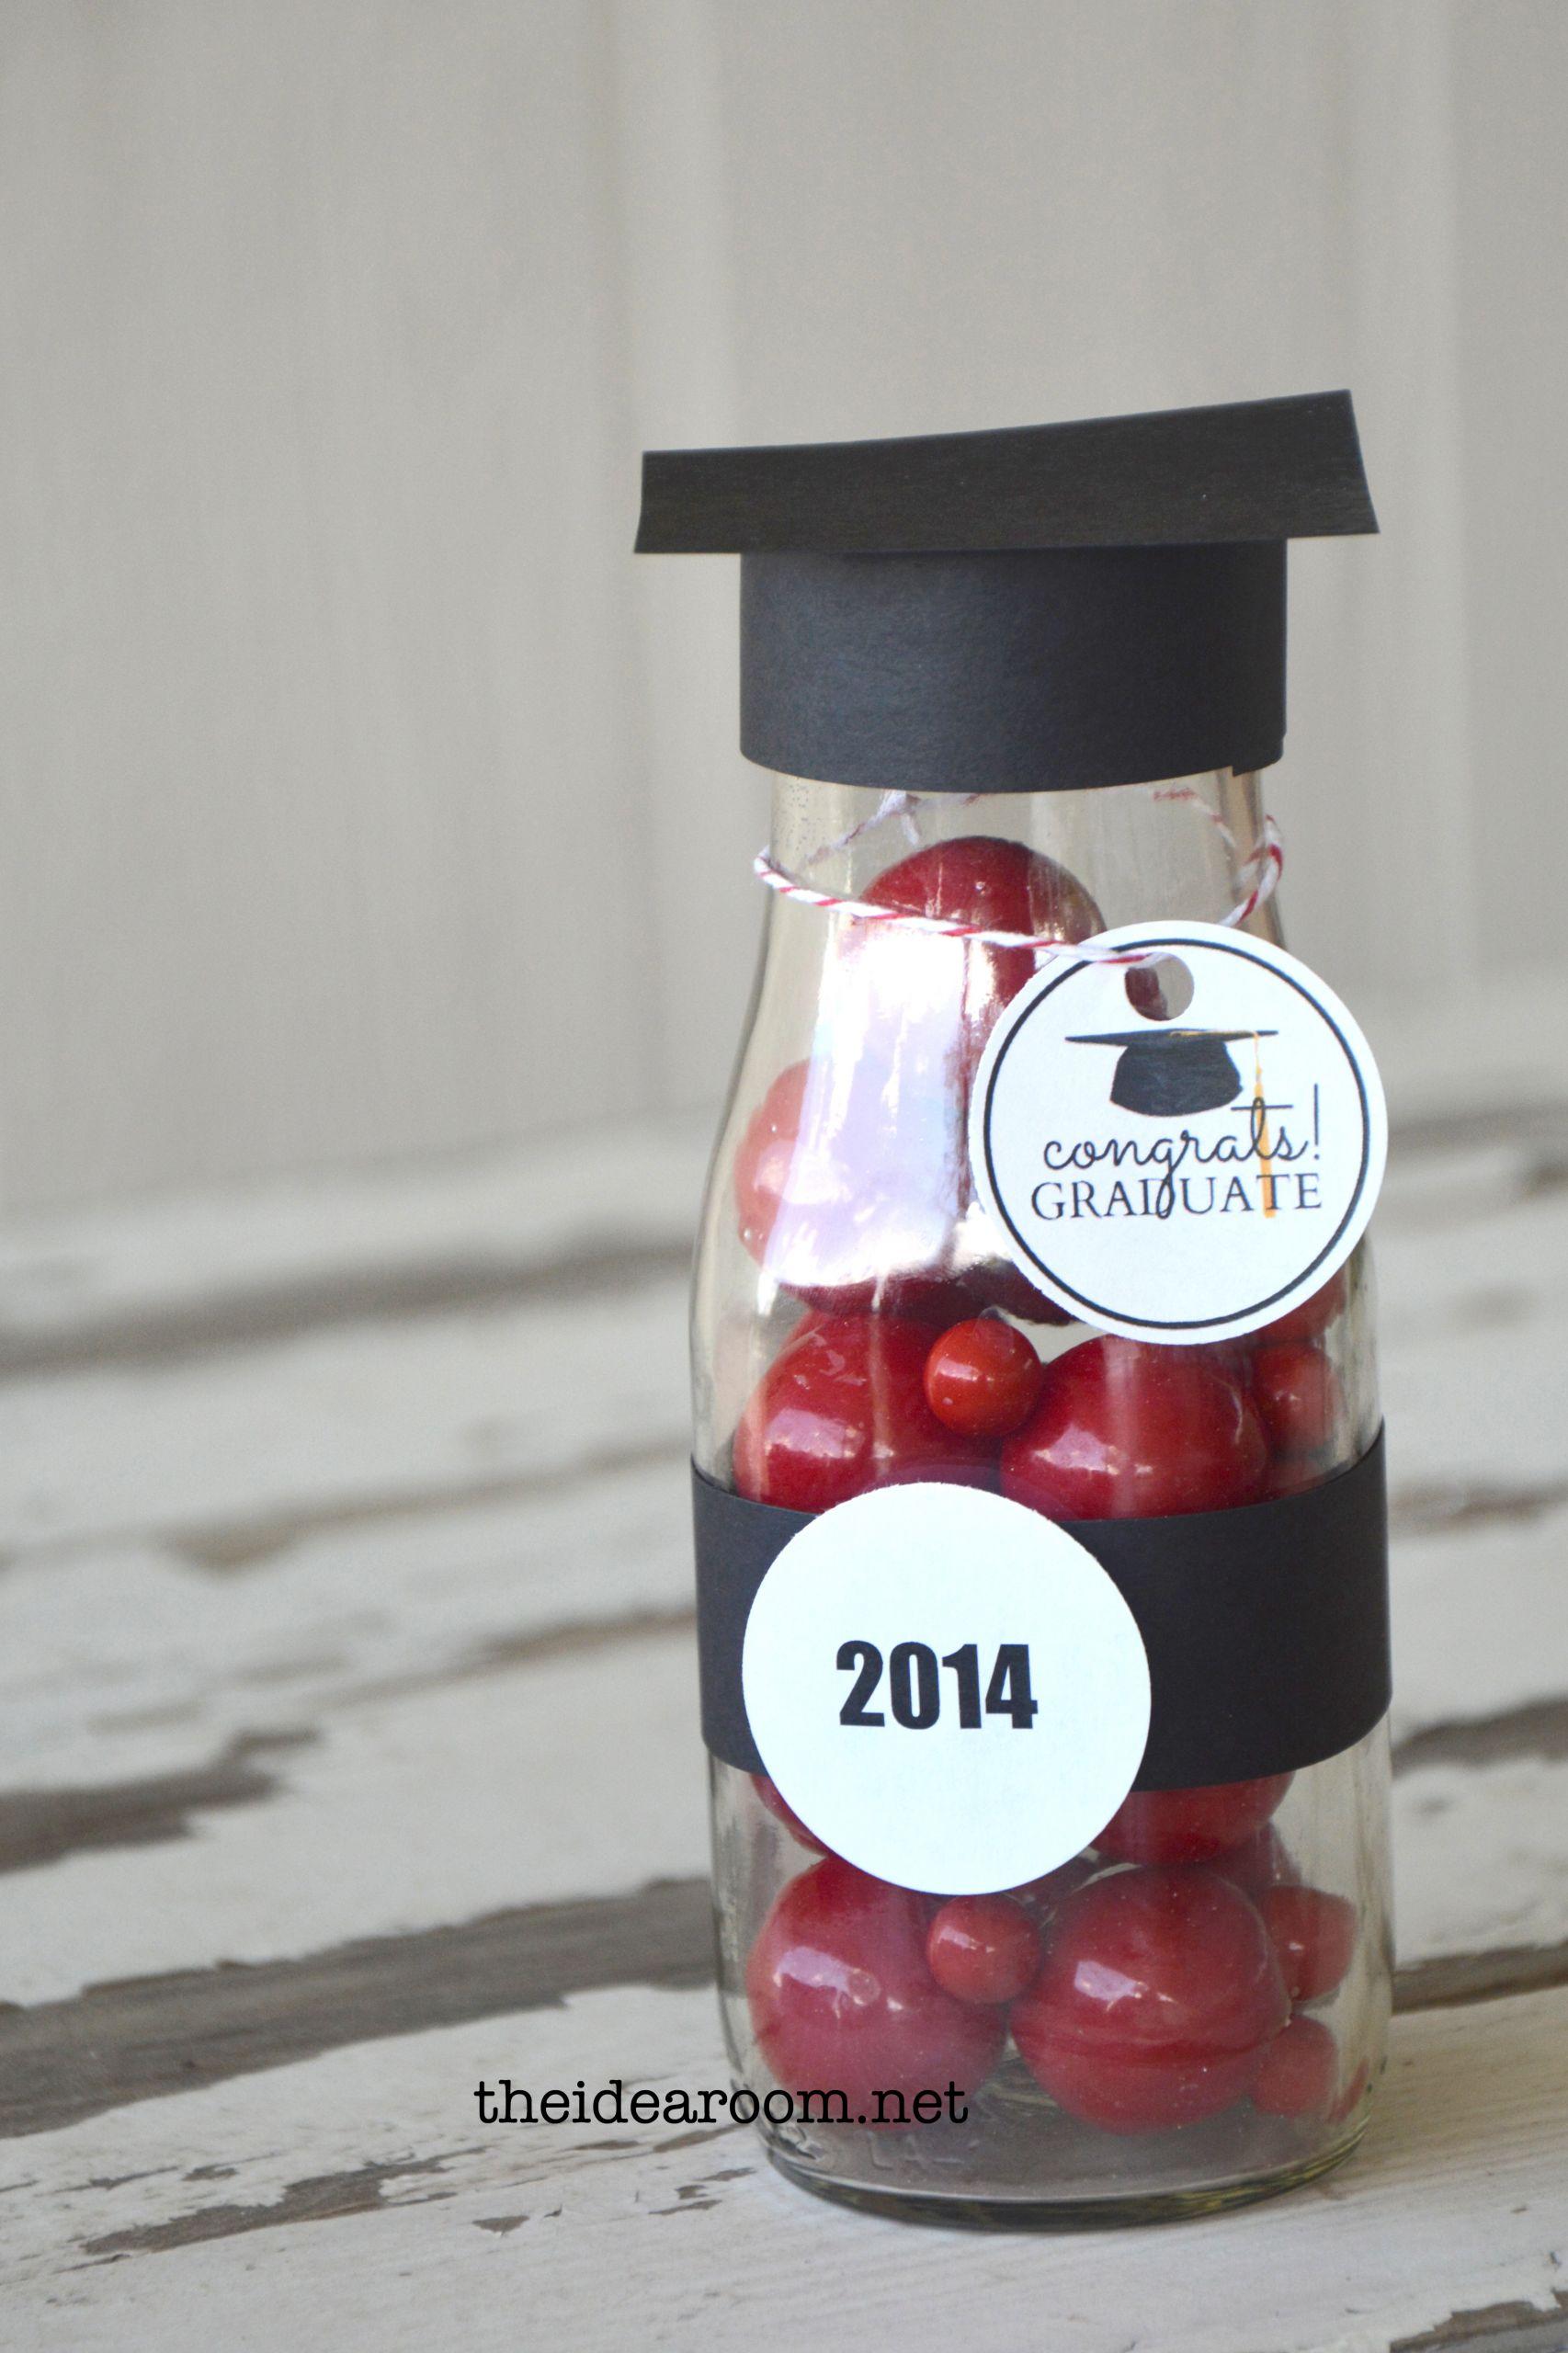 Graduation Gift Ideas Pinterest  Graduation Gift & Pinterest Party The Idea Room